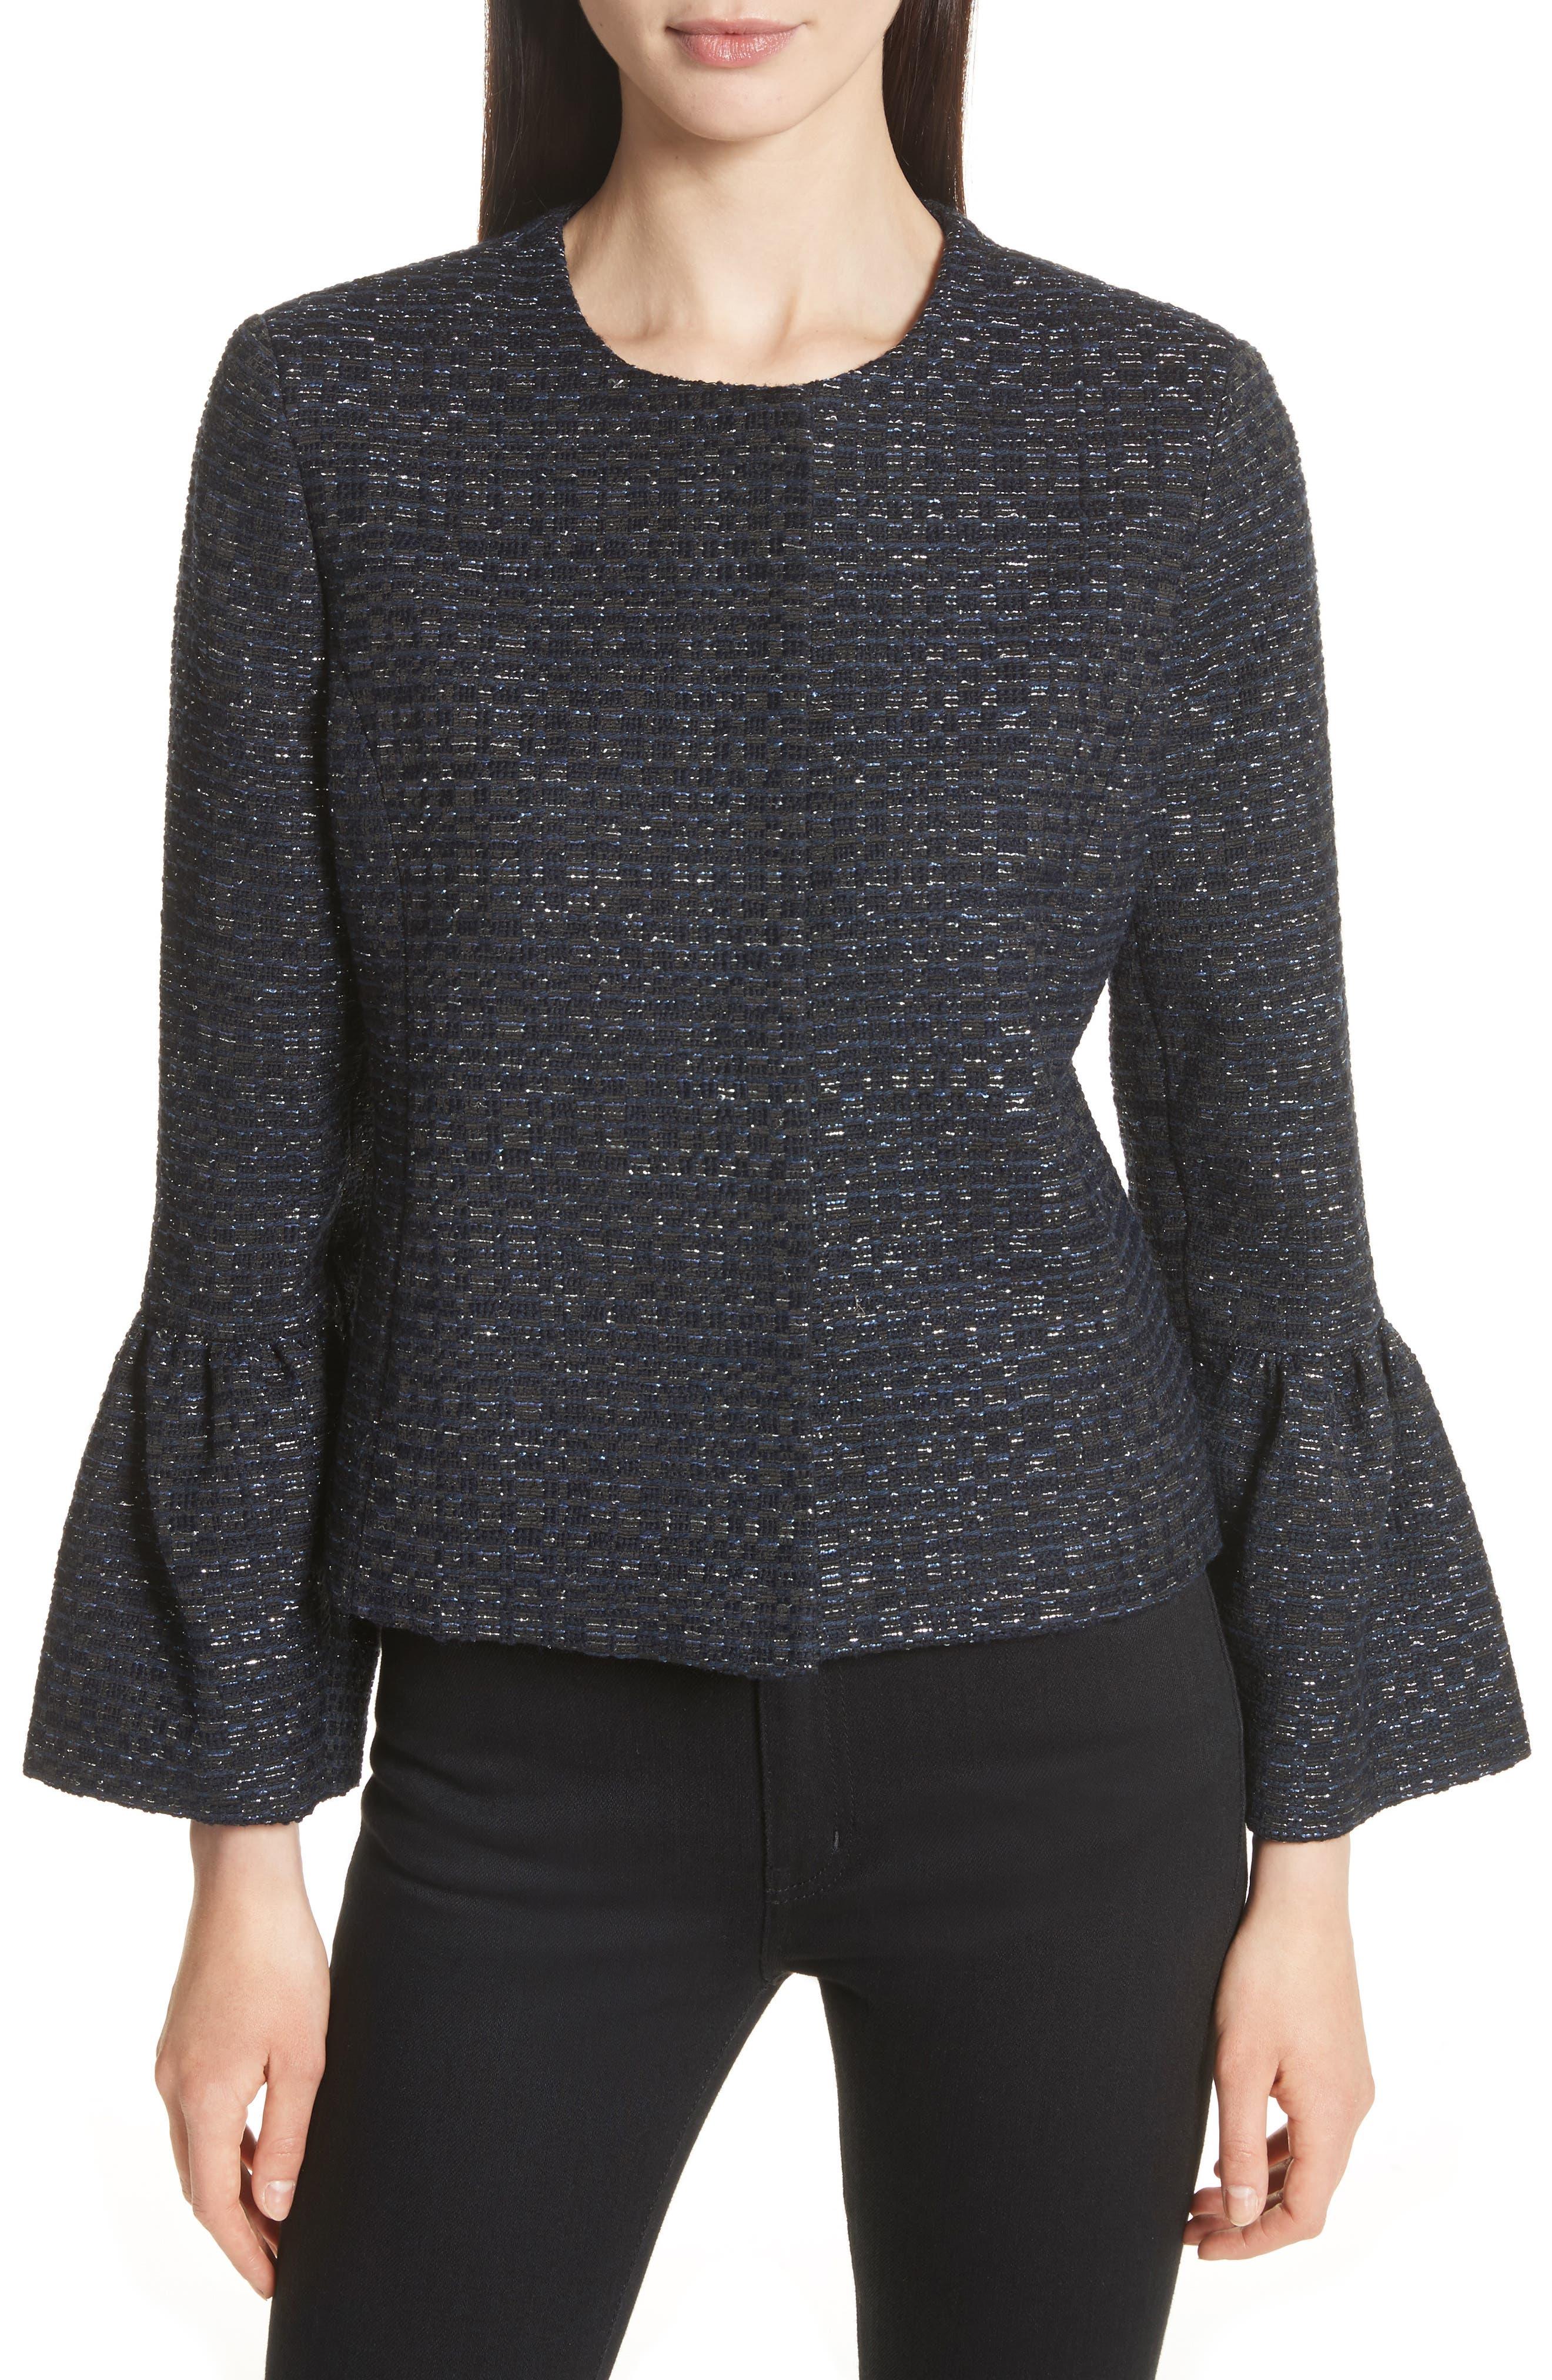 Main Image - Helene Berman Zoe Bell Cuff Tweed Jacket